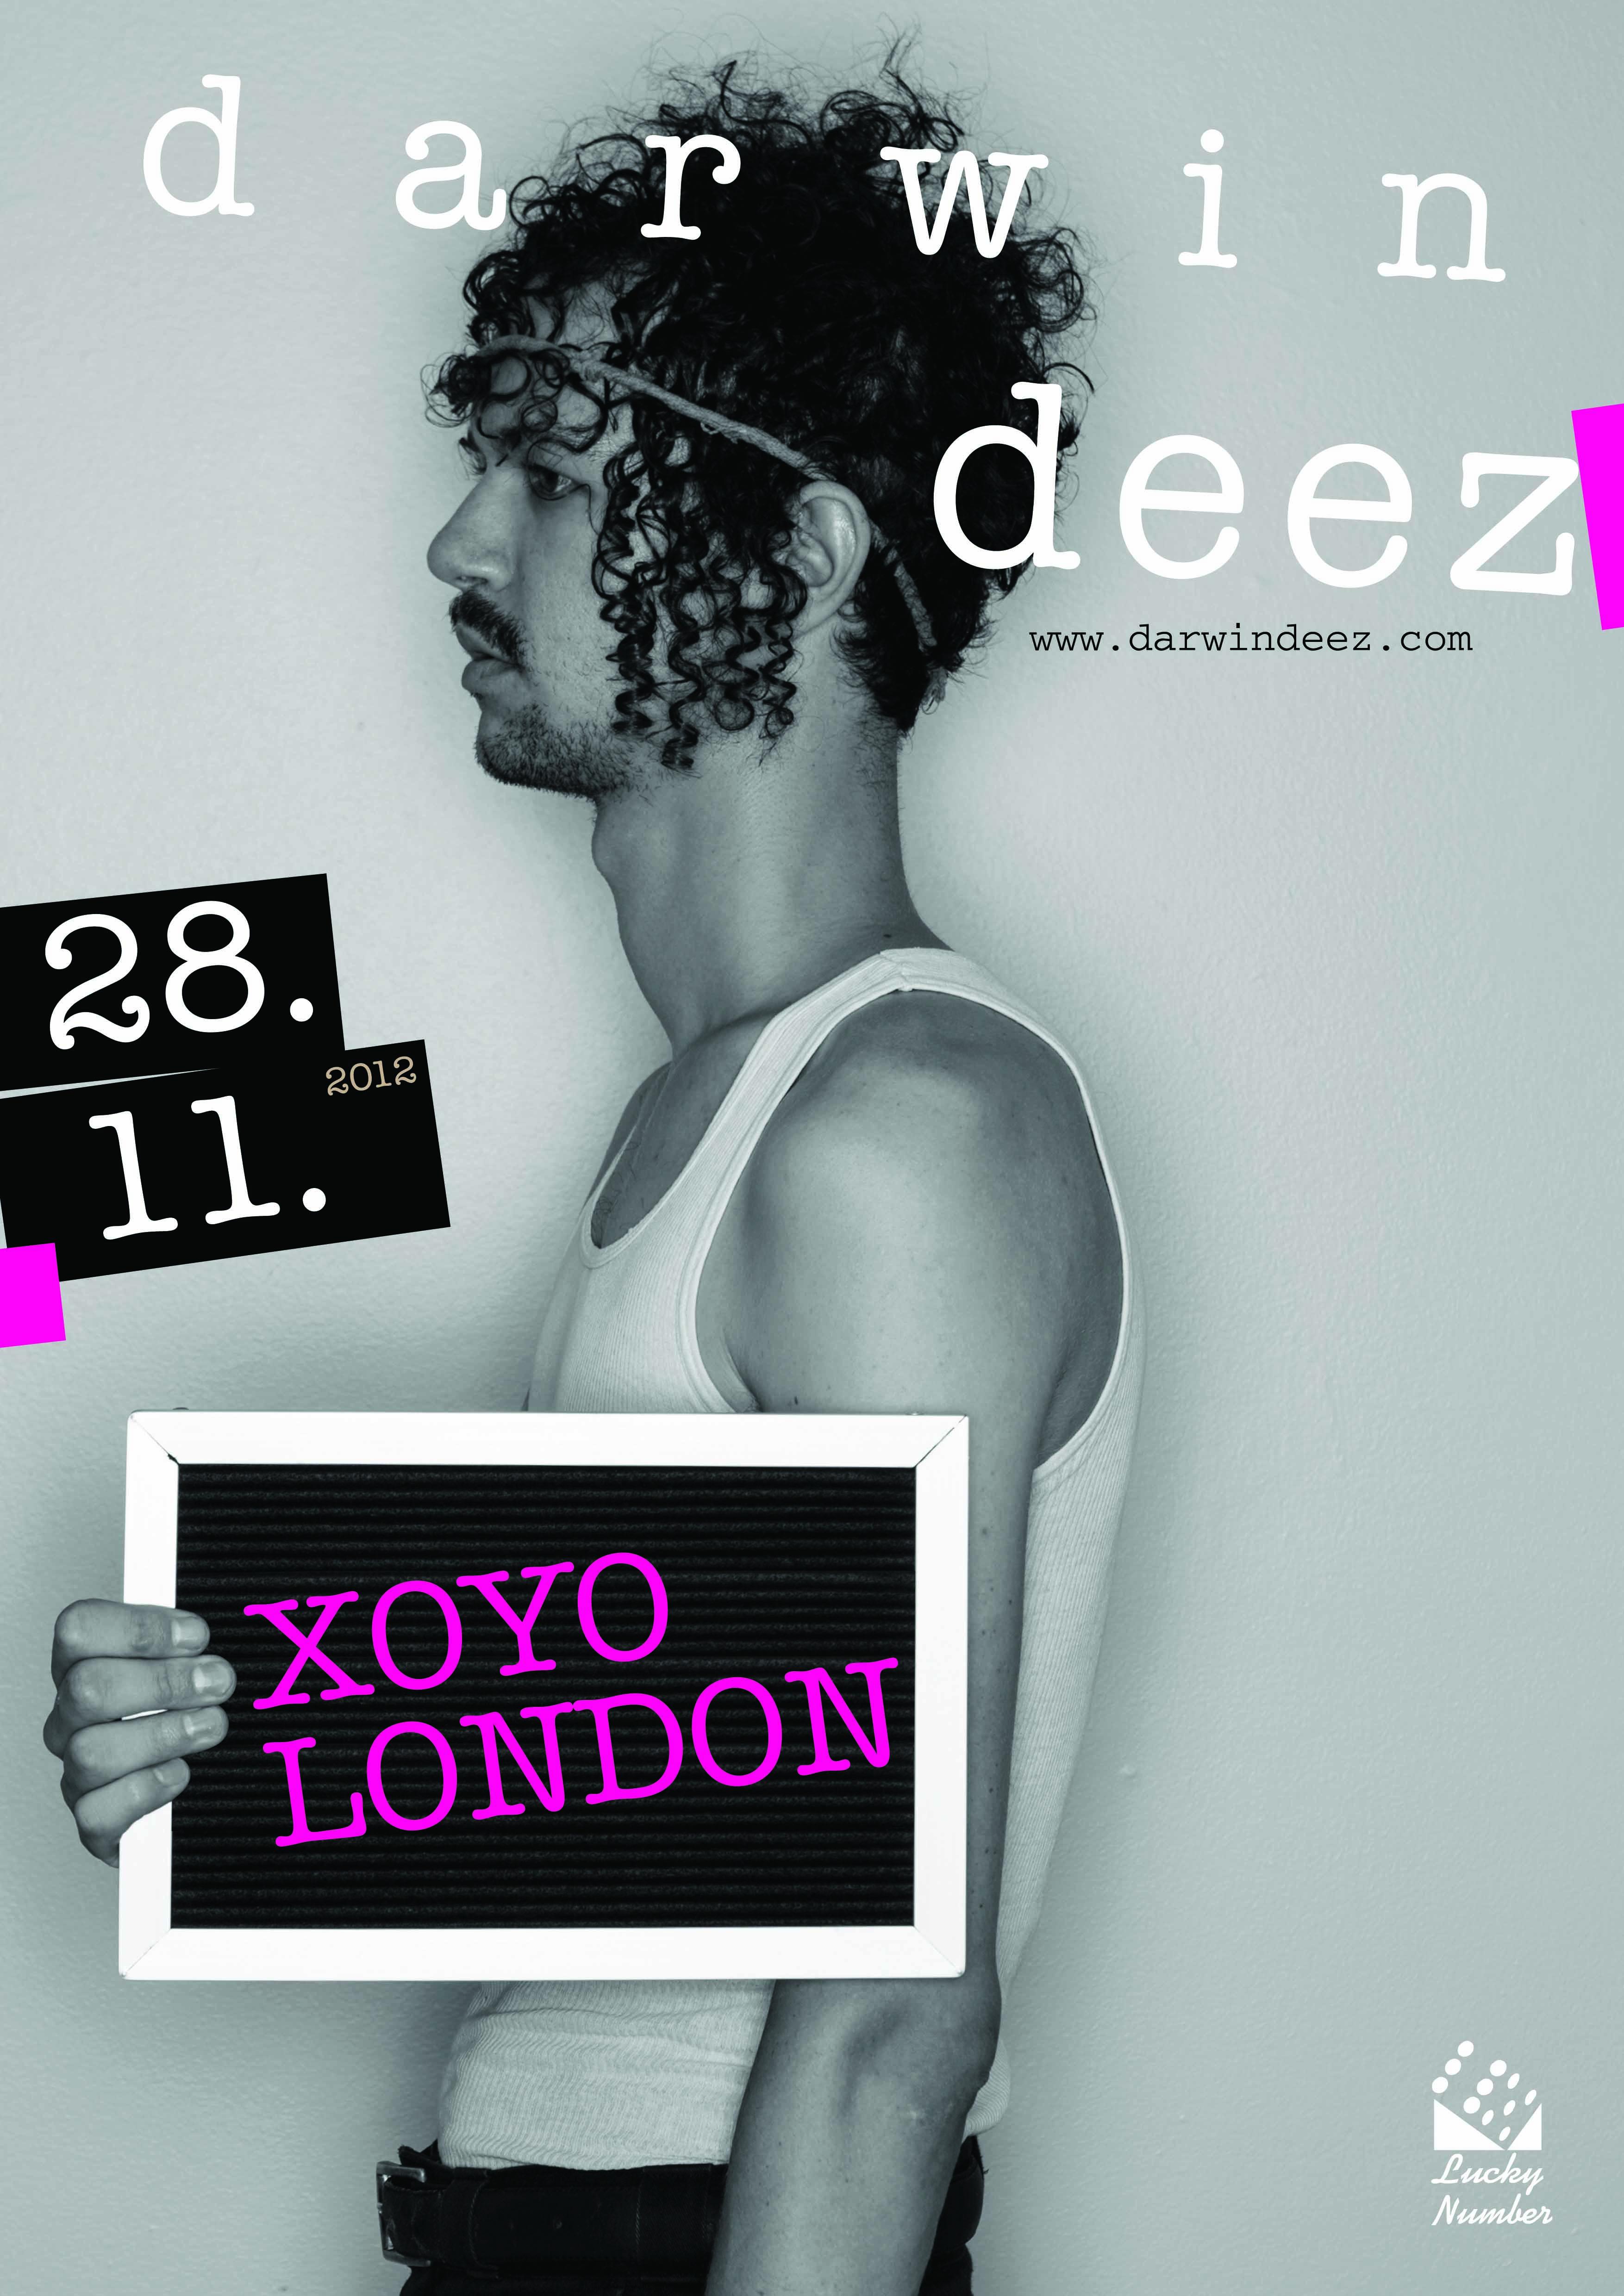 Darwin Deez Tour Dates 2012 Announced